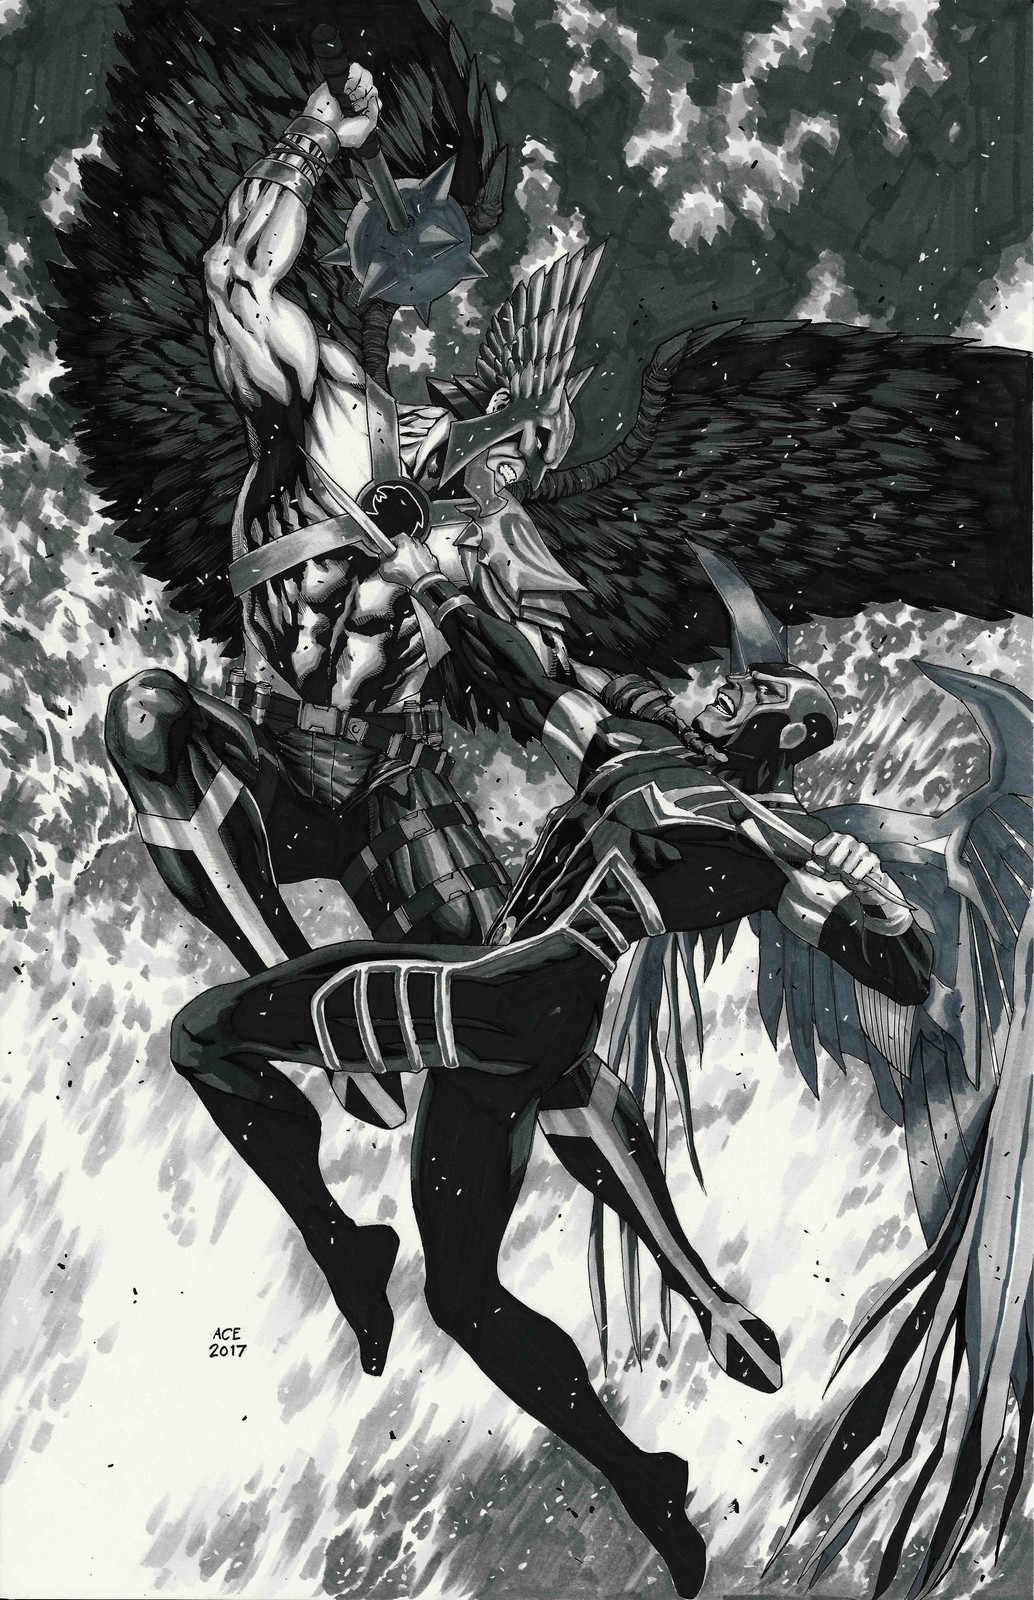 Hawkman vs Archangel